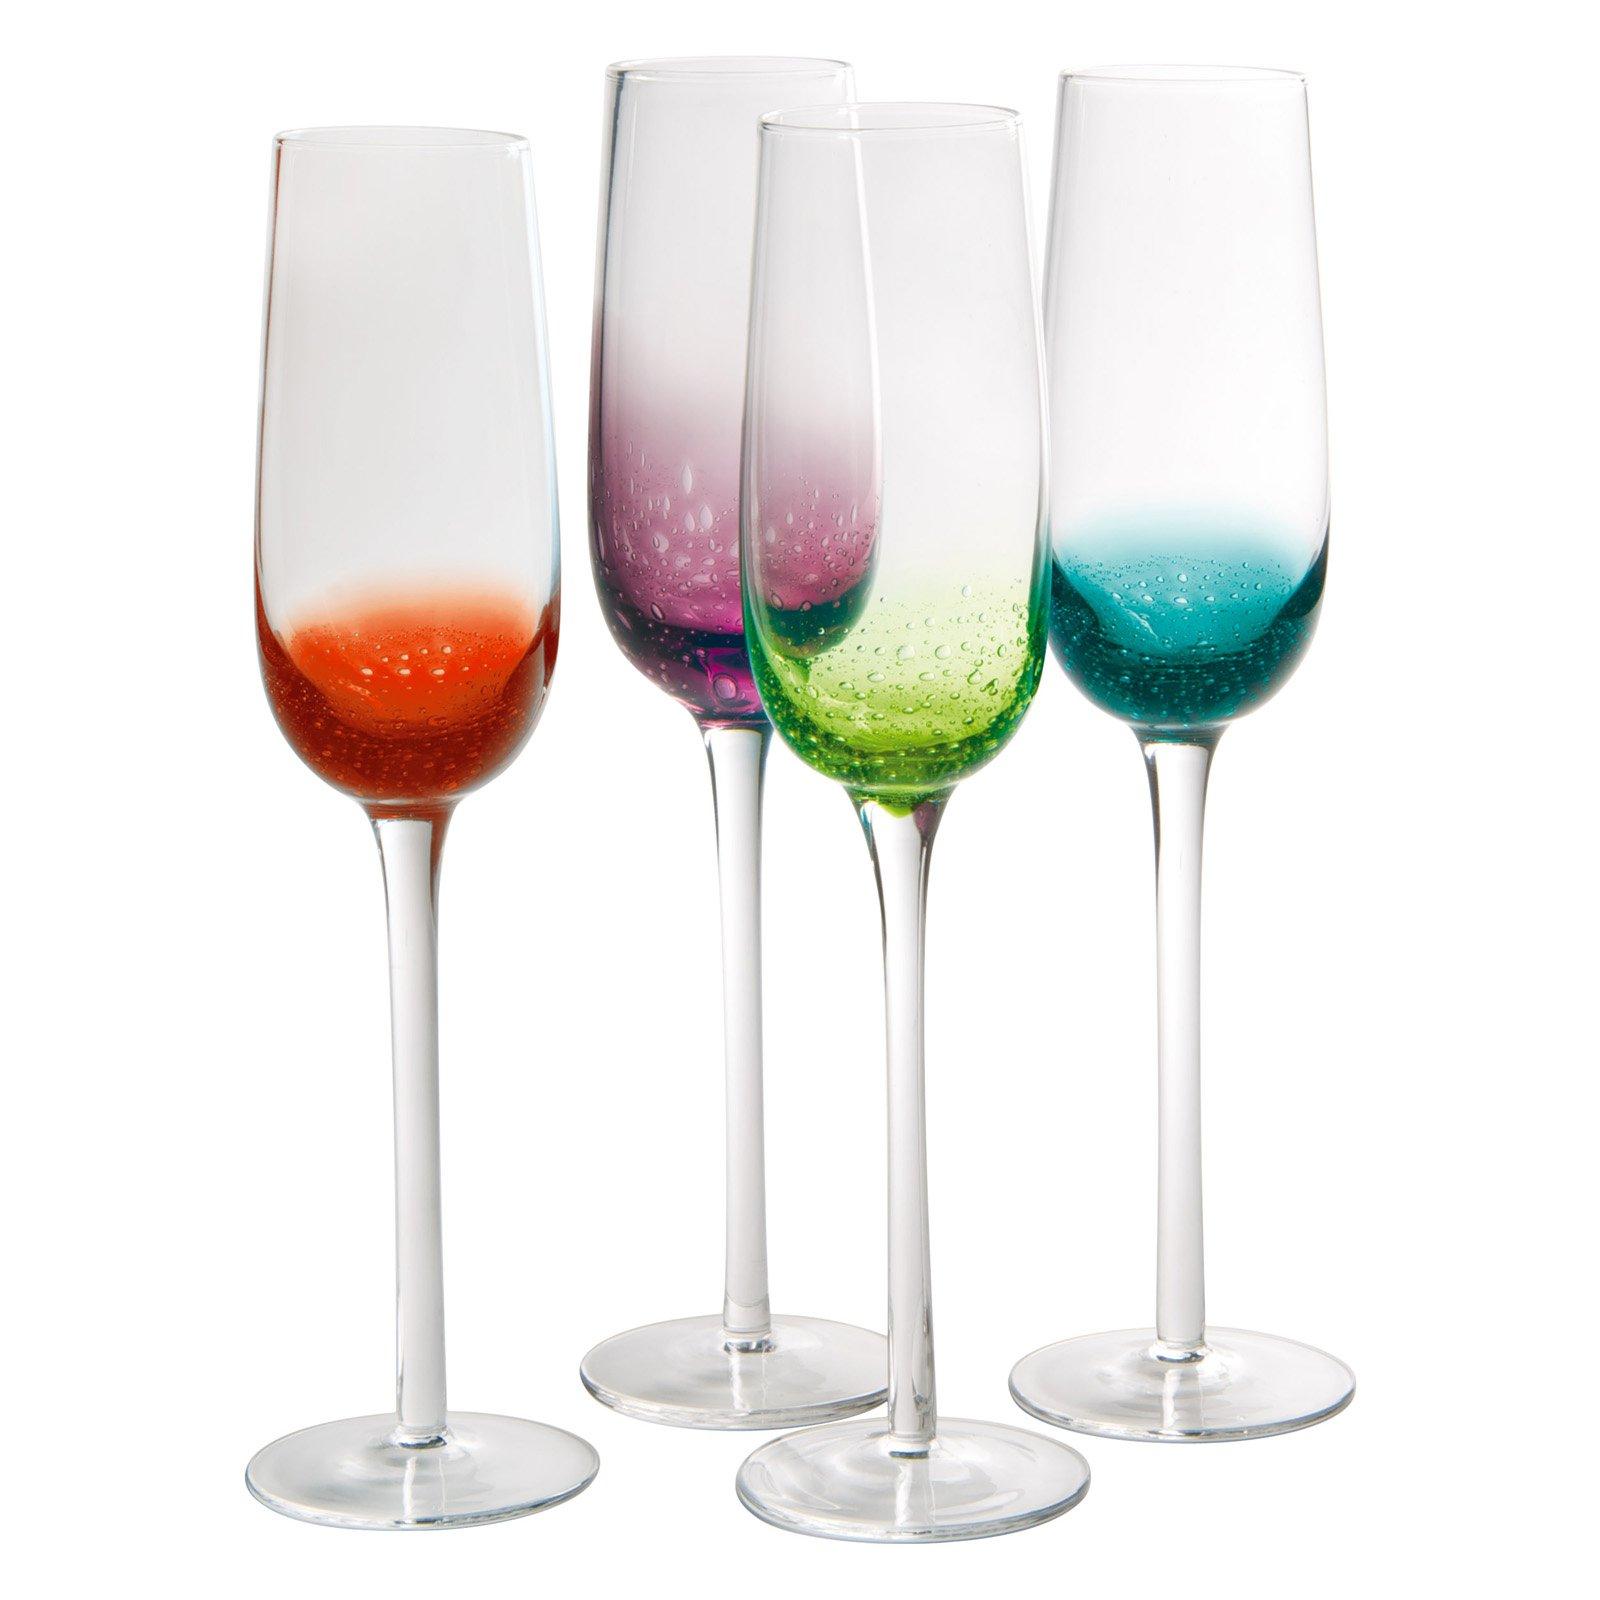 Artland Inc. Fizzy Champagne Flutes - Set of 4